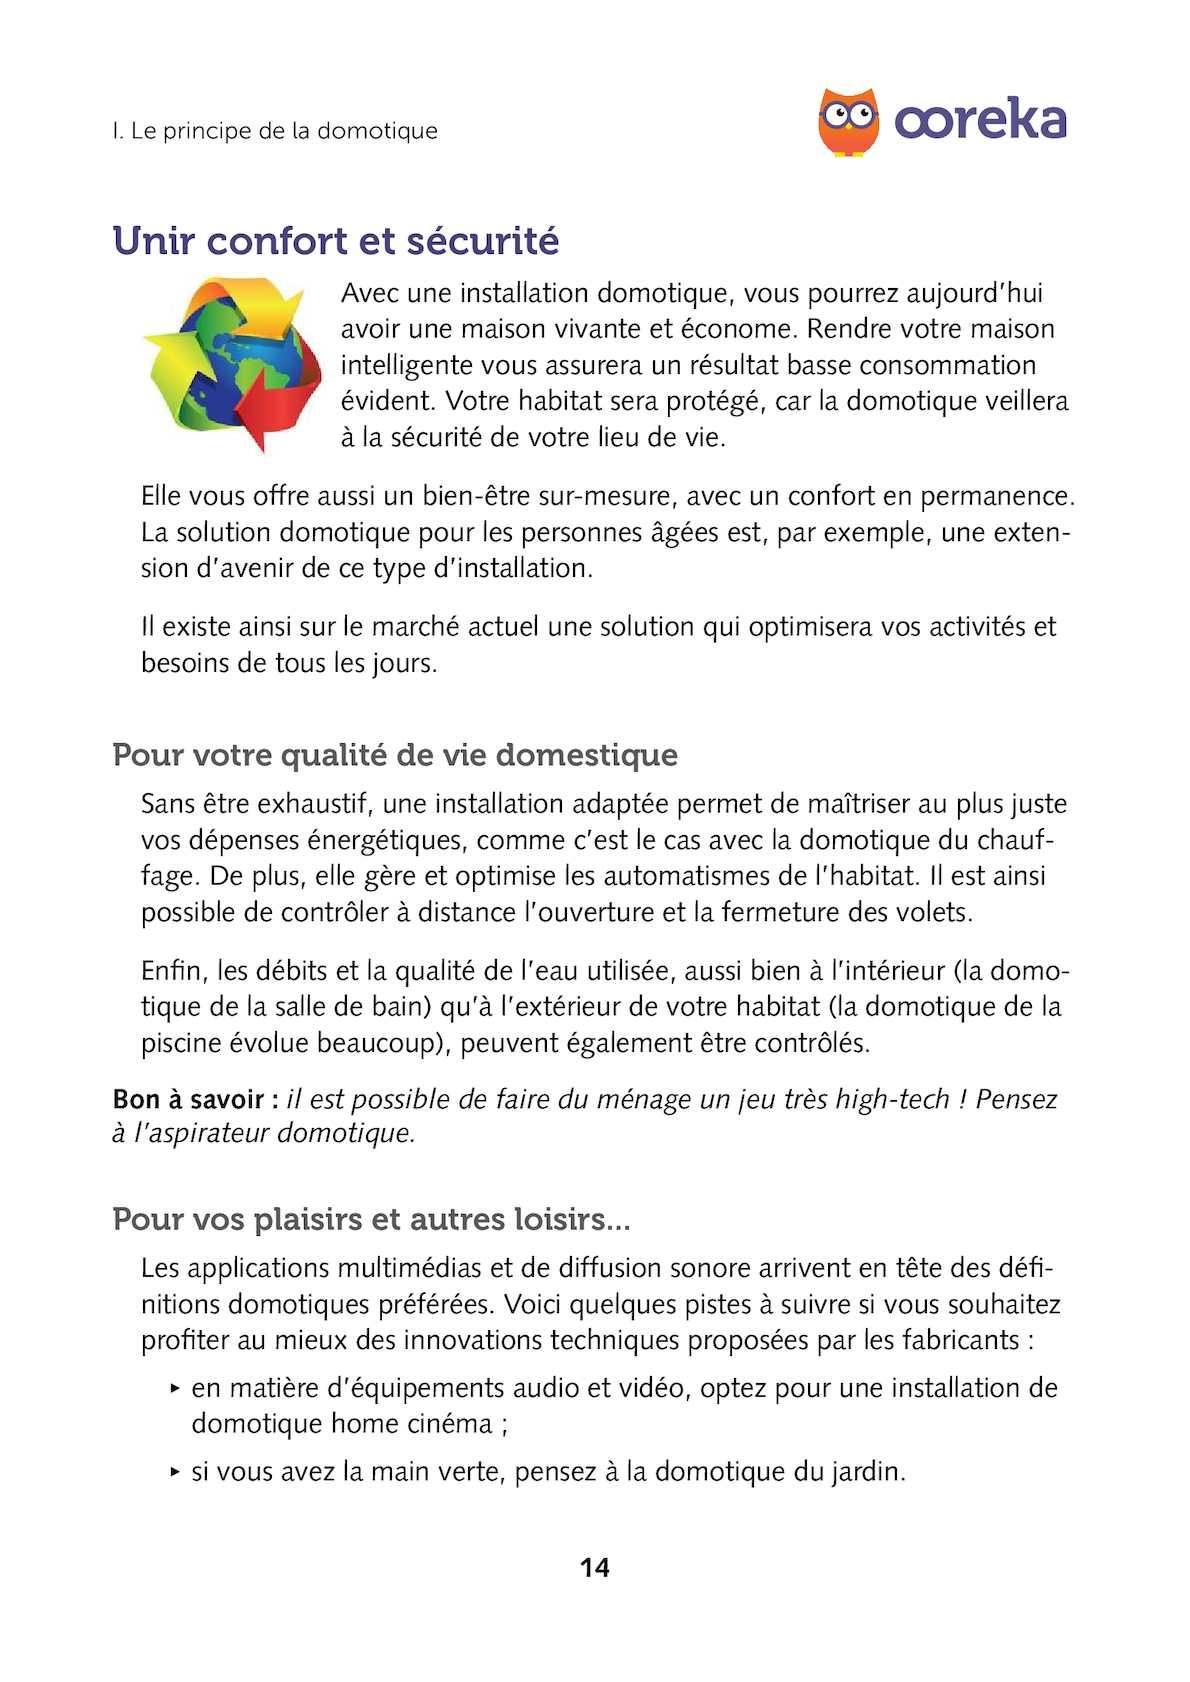 aca2b097c54 Le Guide De La Domotique Ooreka - CALAMEO Downloader